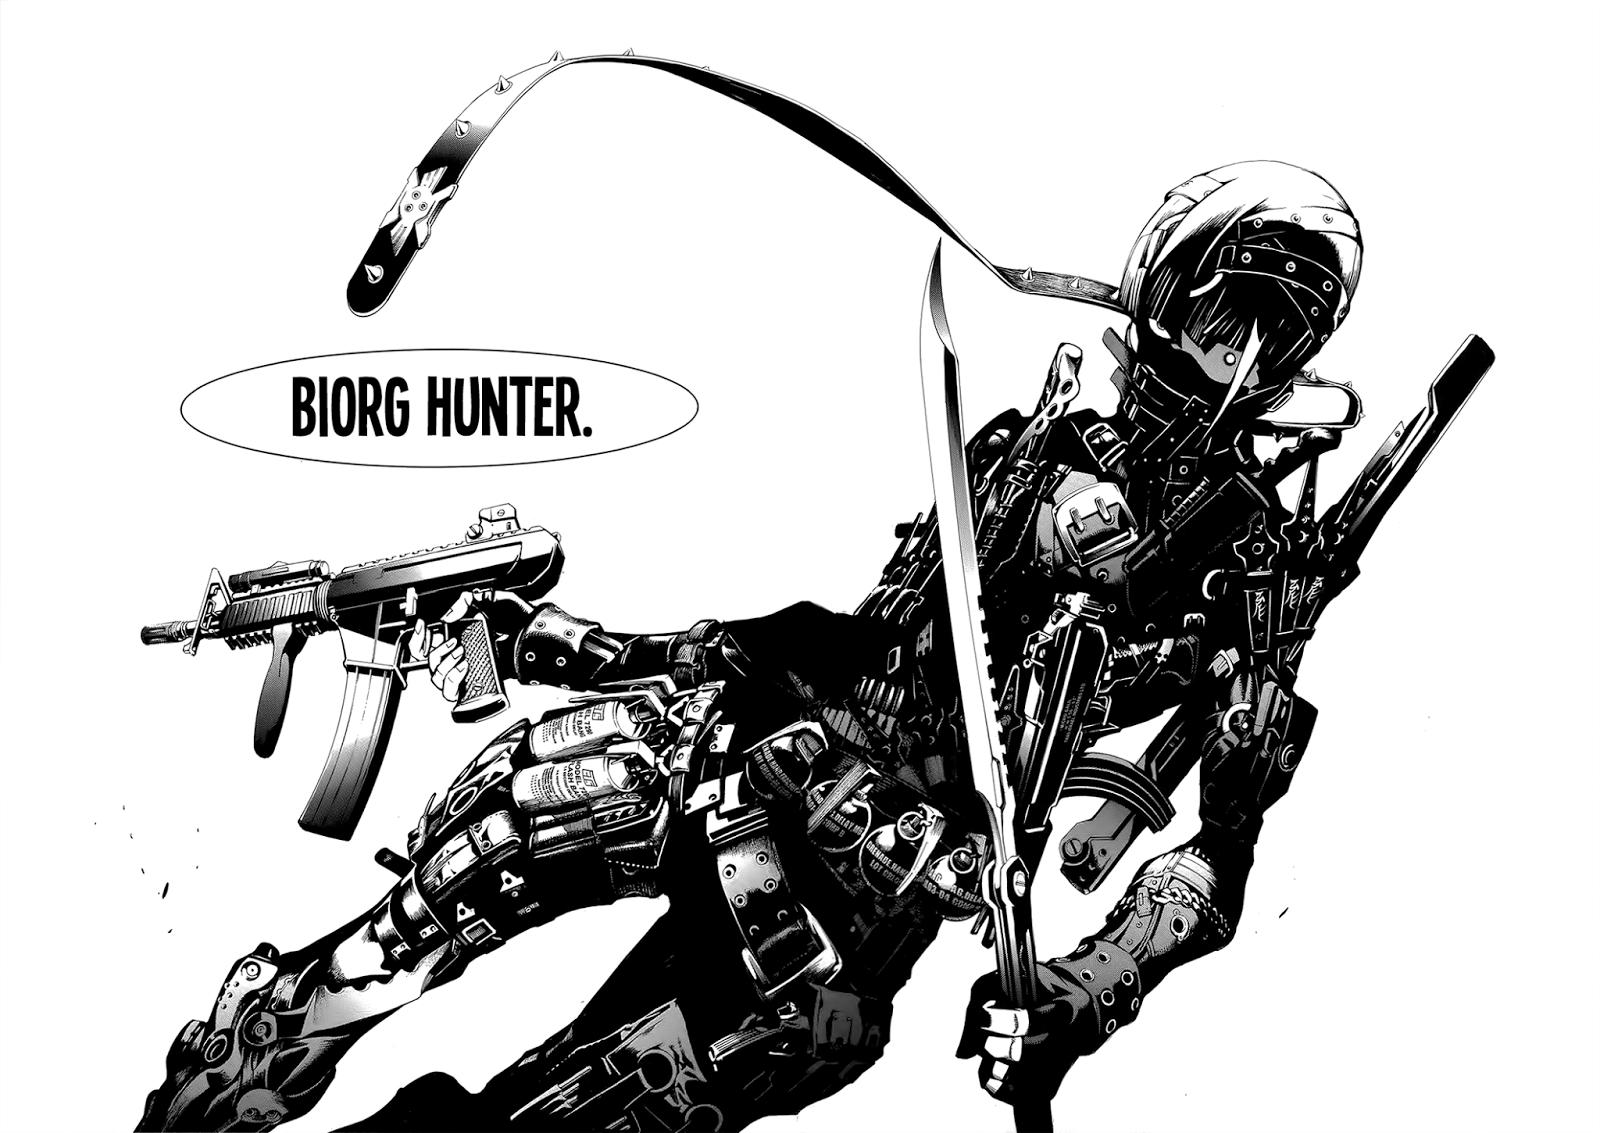 Actu Manga, Biorg Trinity, Critique Manga, Kaze, Kaze Manga, Manga, Oh Great,